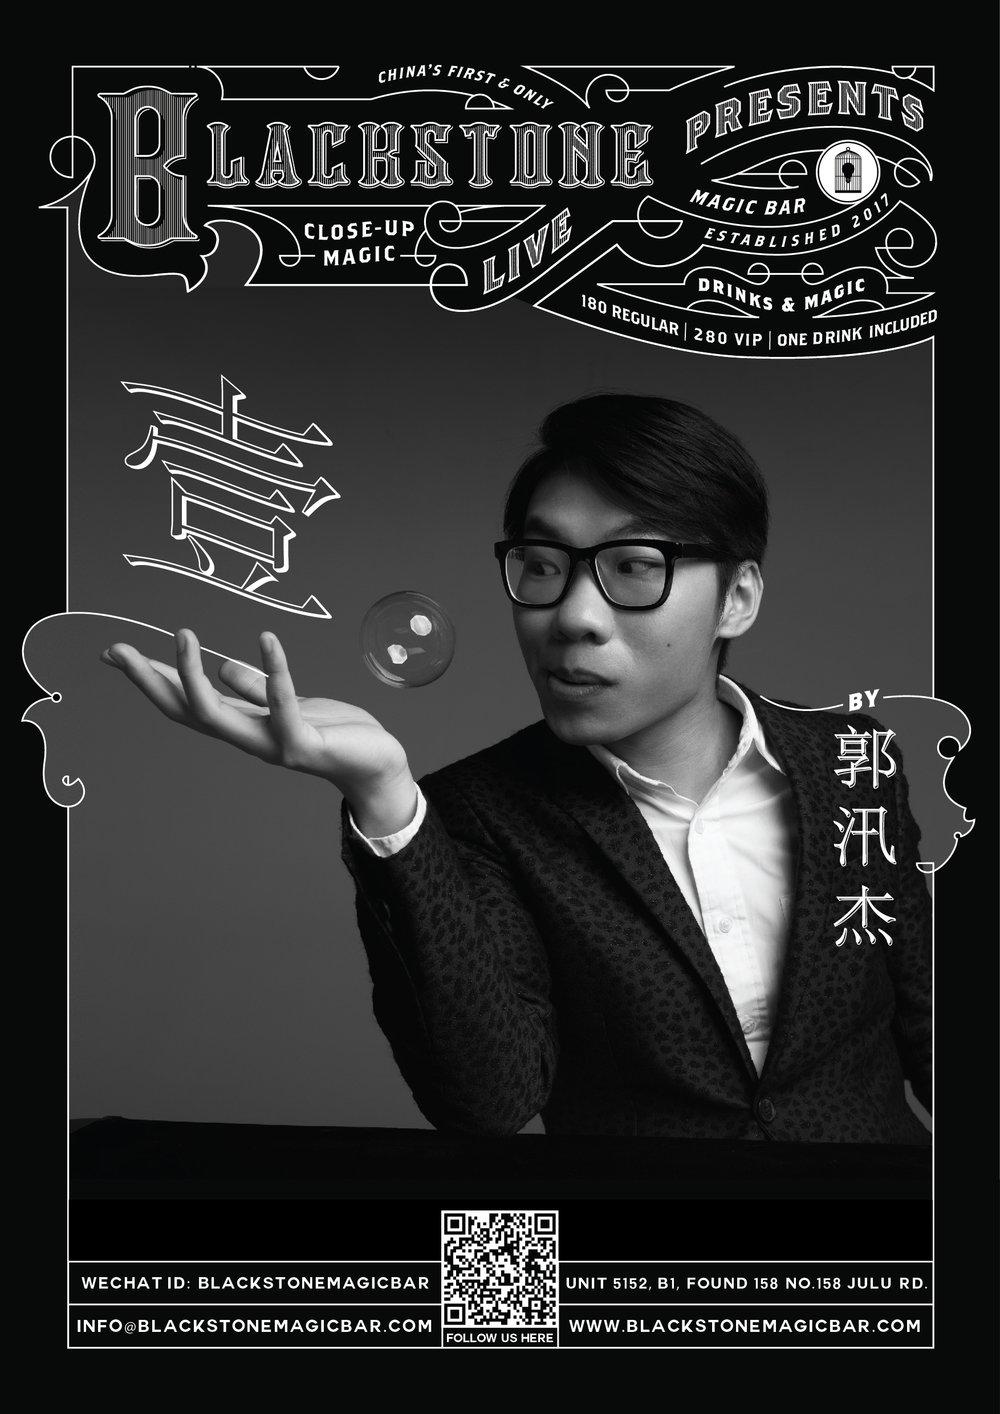 BLACKSTONE LIVE - 超凡魔术师 郭汛杰